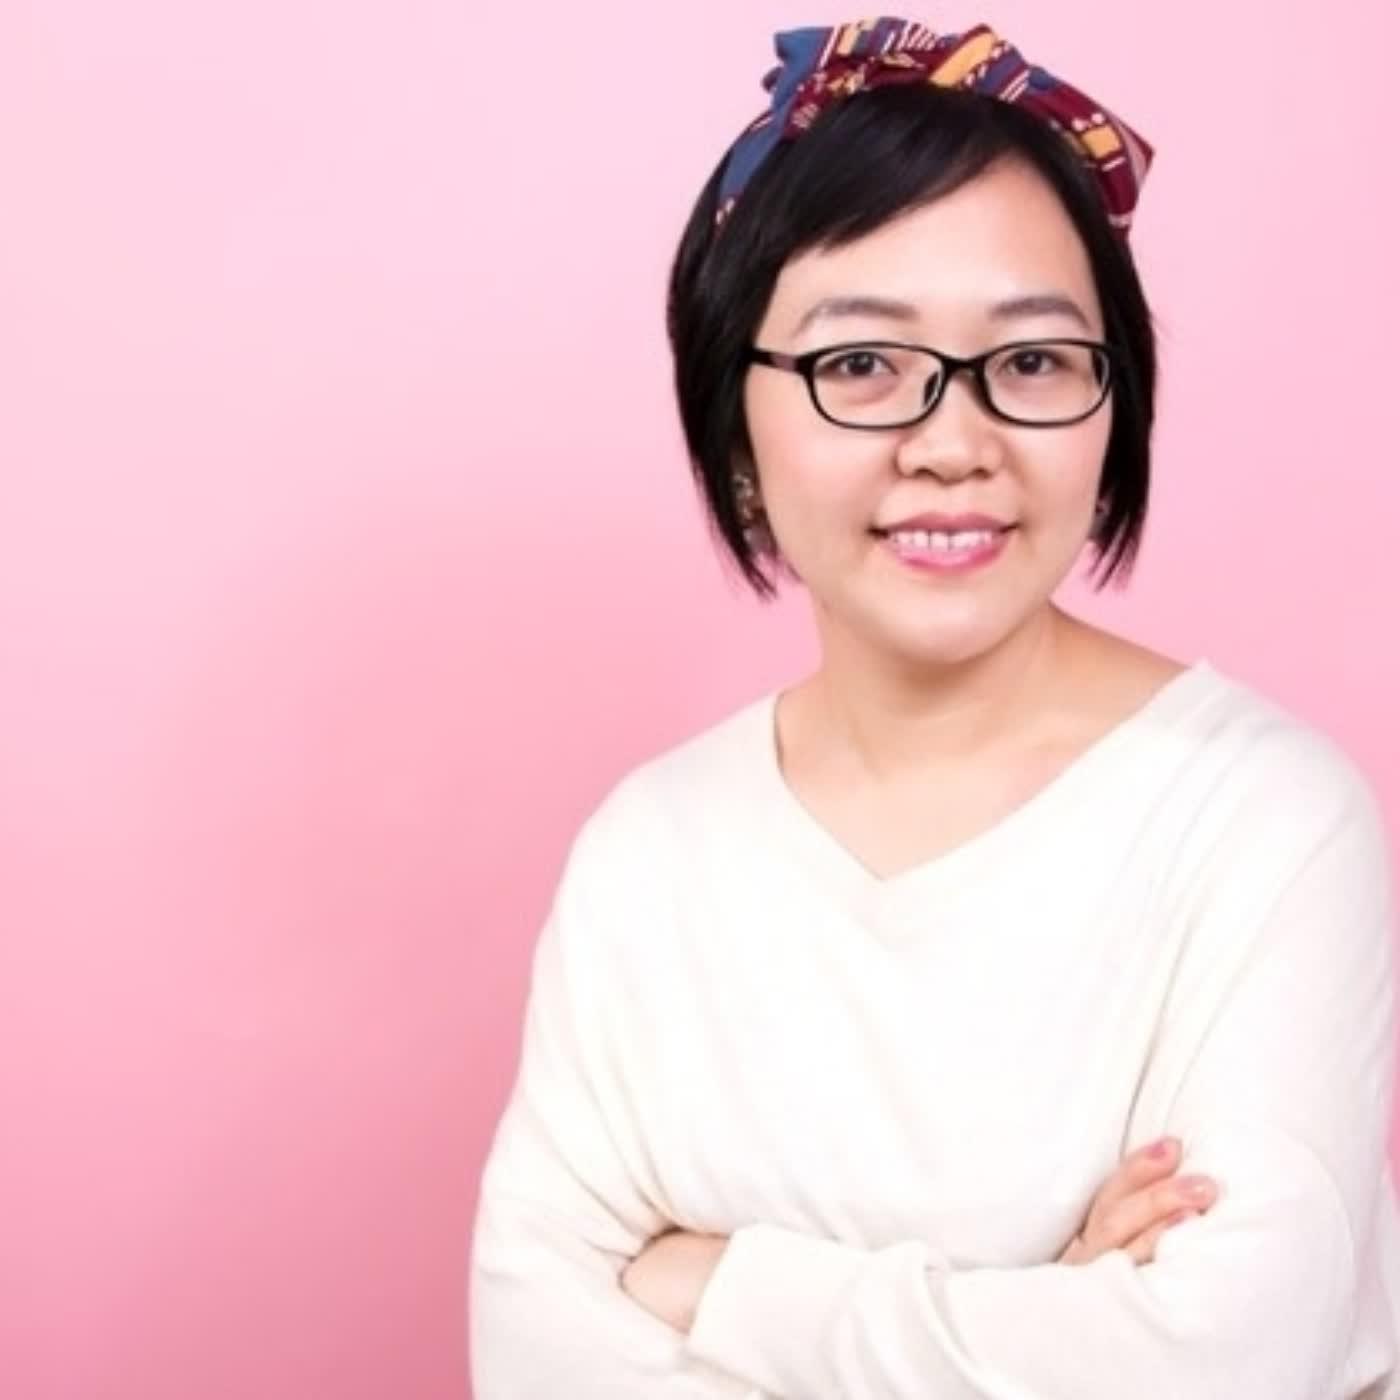 Qistin Wong 蔬食生活